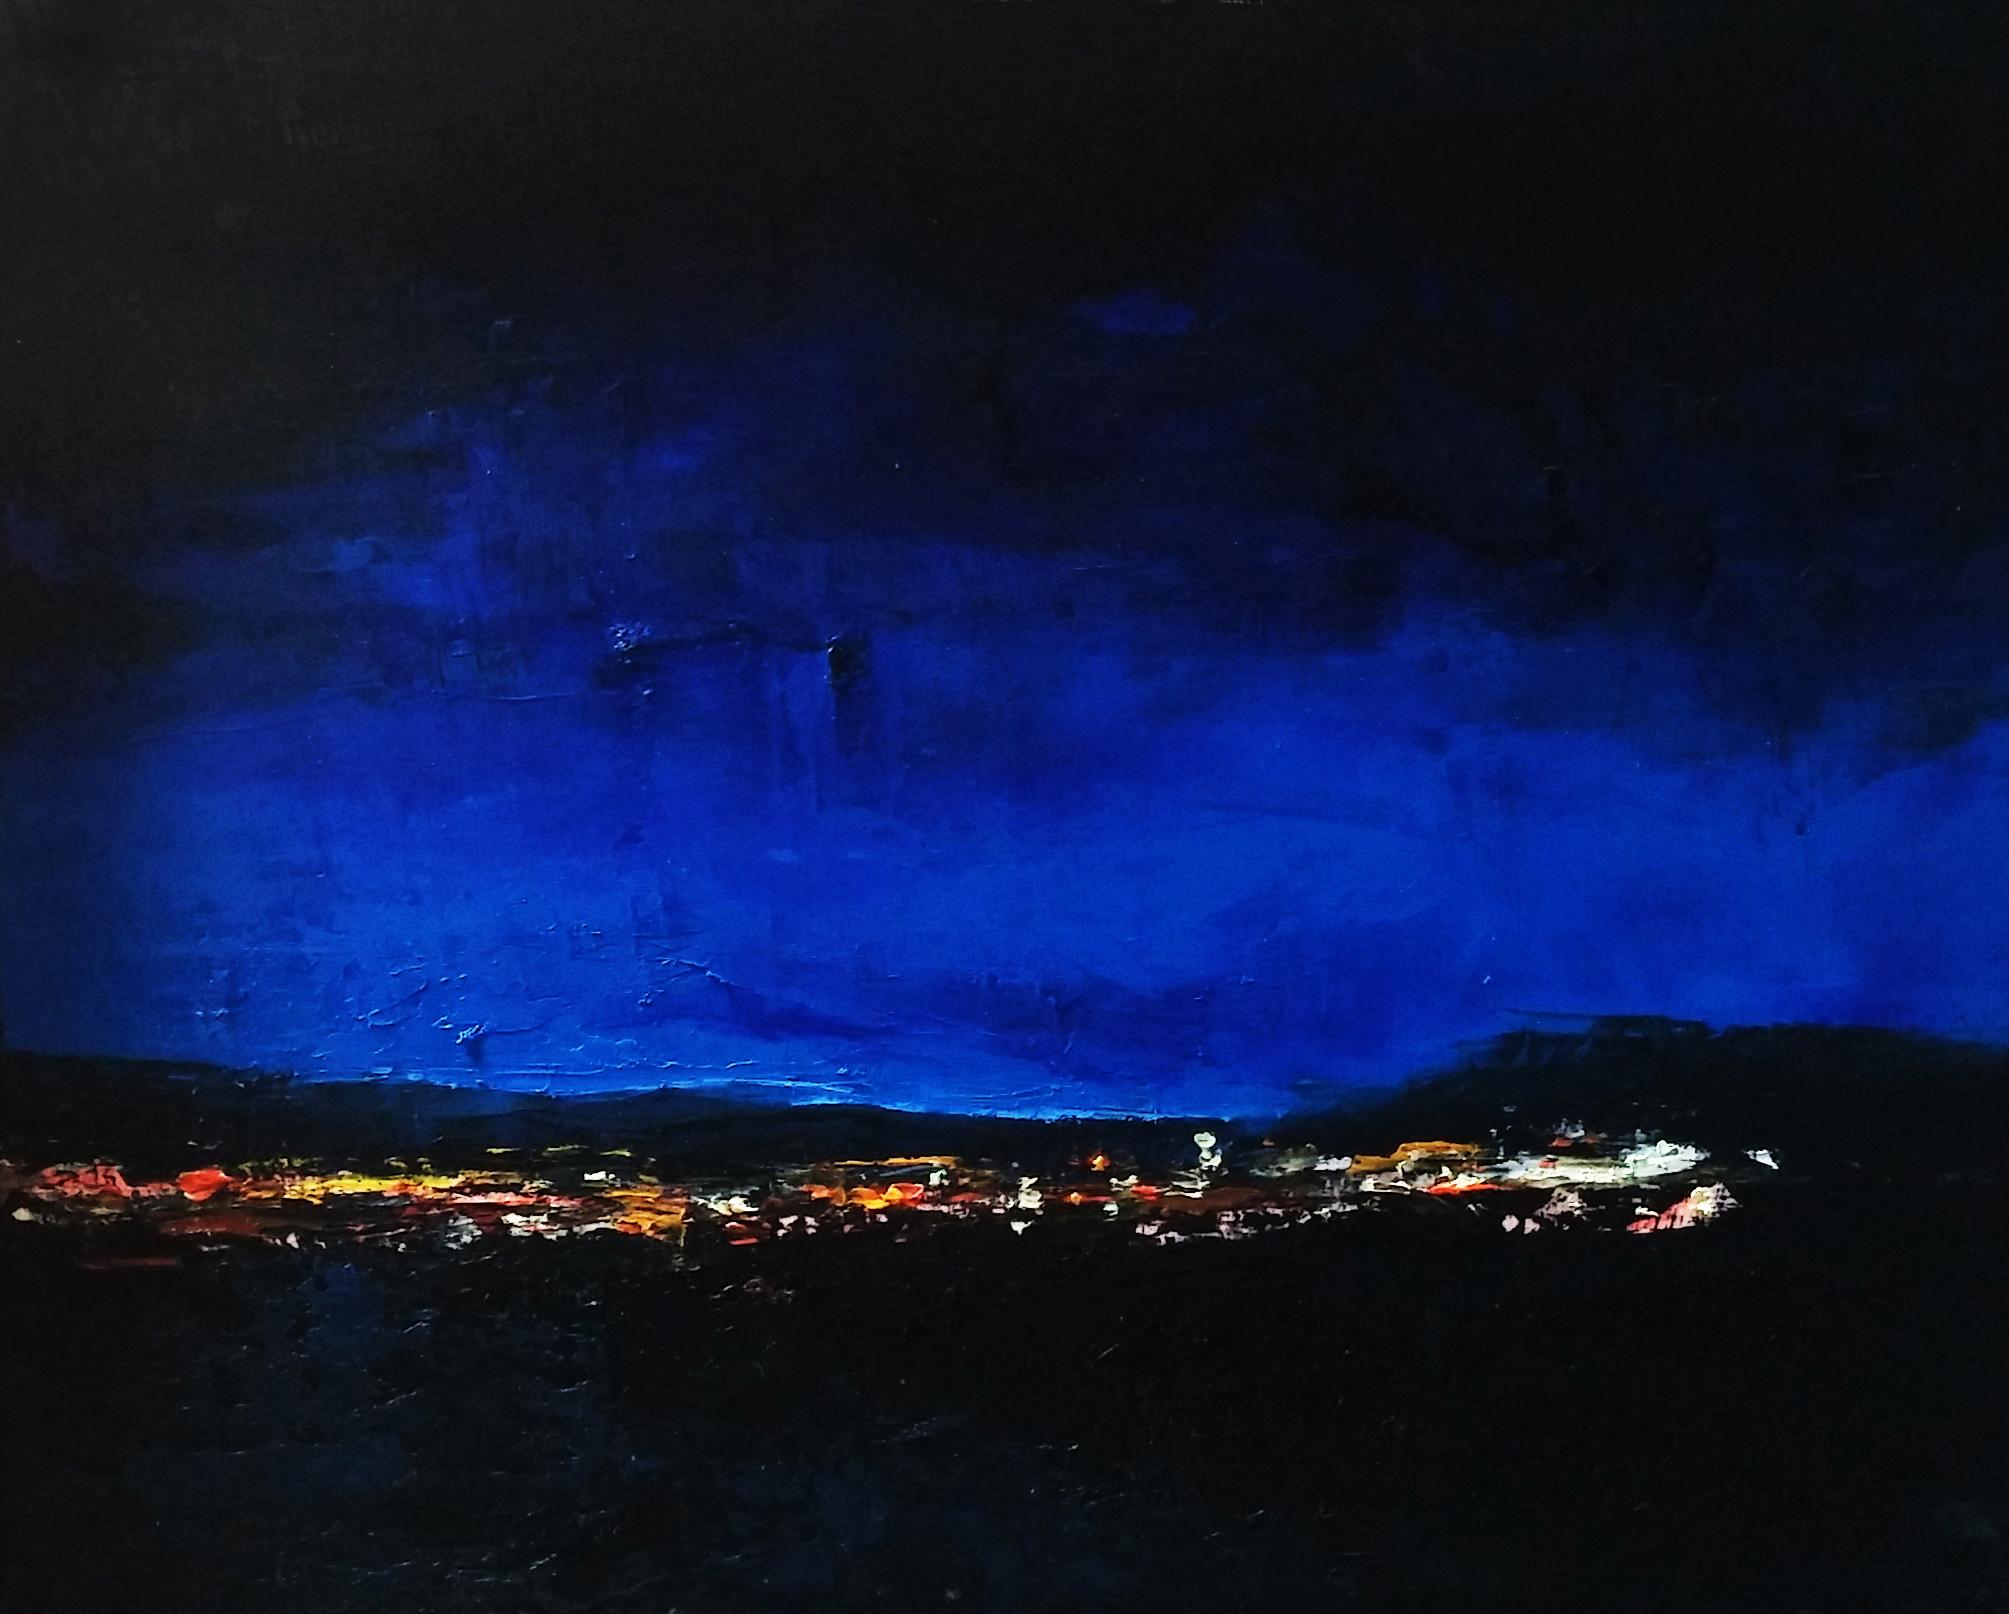 City (Albuquerque)